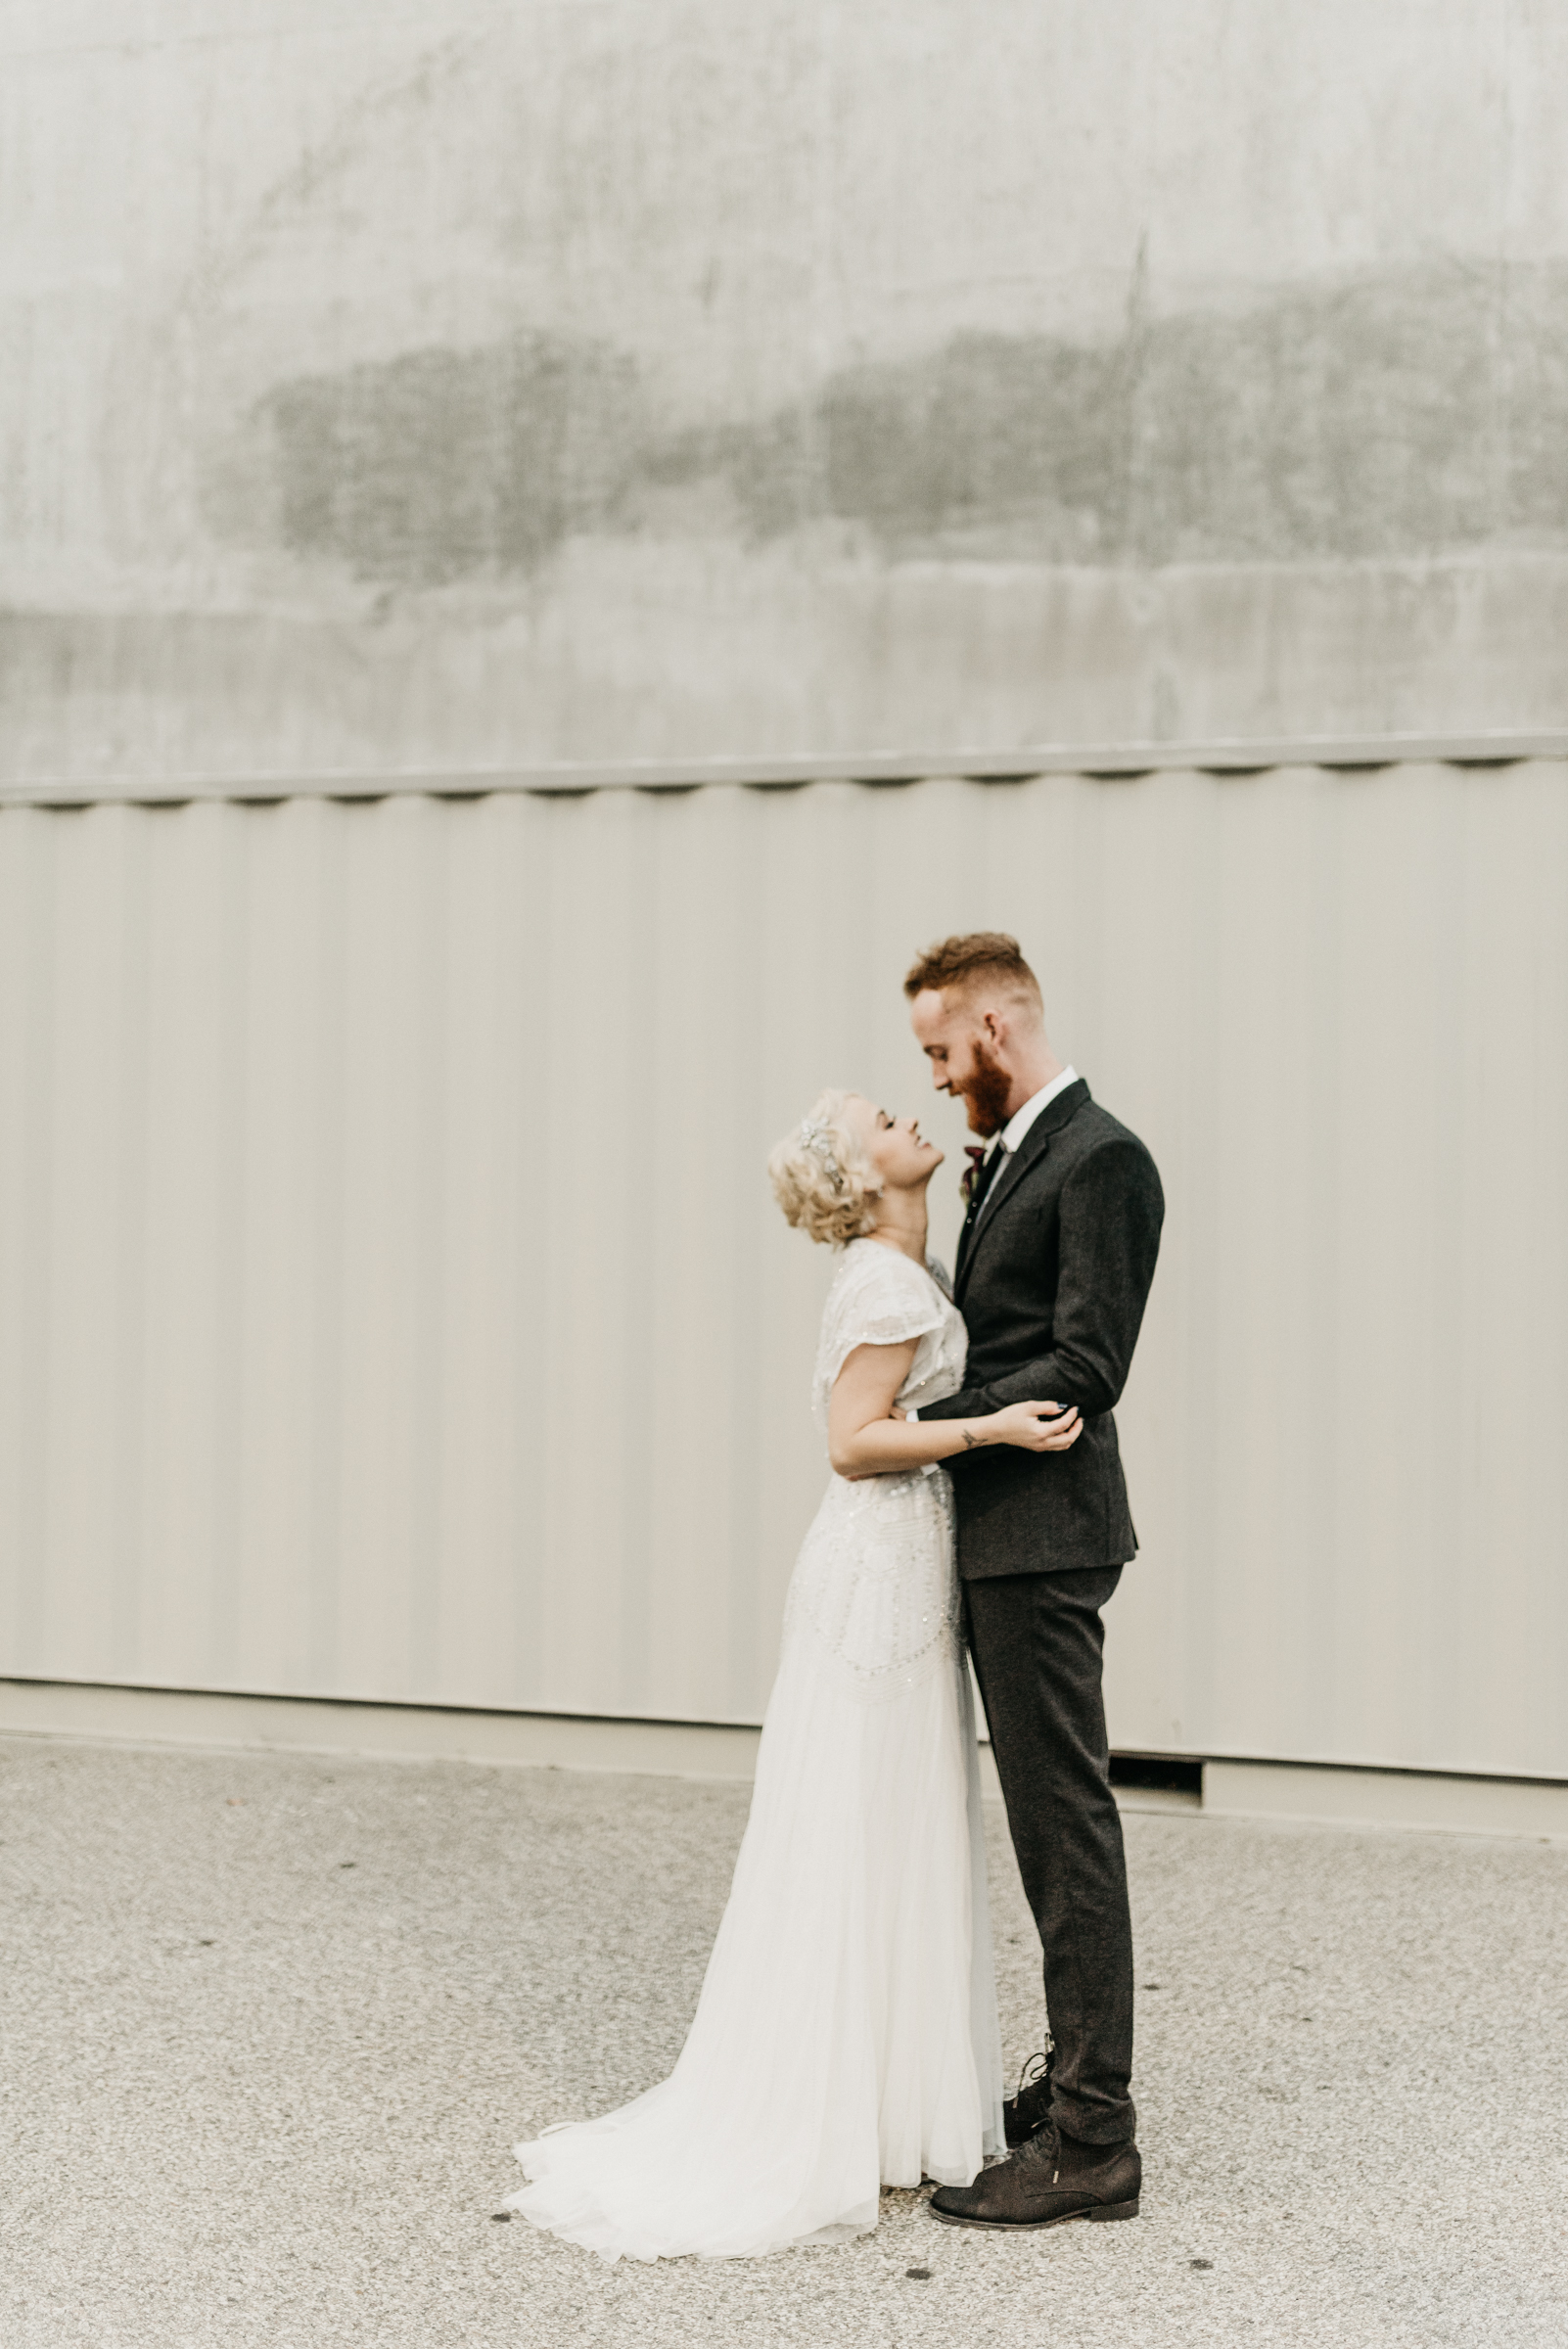 ©Isaiah + Taylor Photography - Studio 11 Wedding, Los Angeles Wedding Photographer-149.jpg